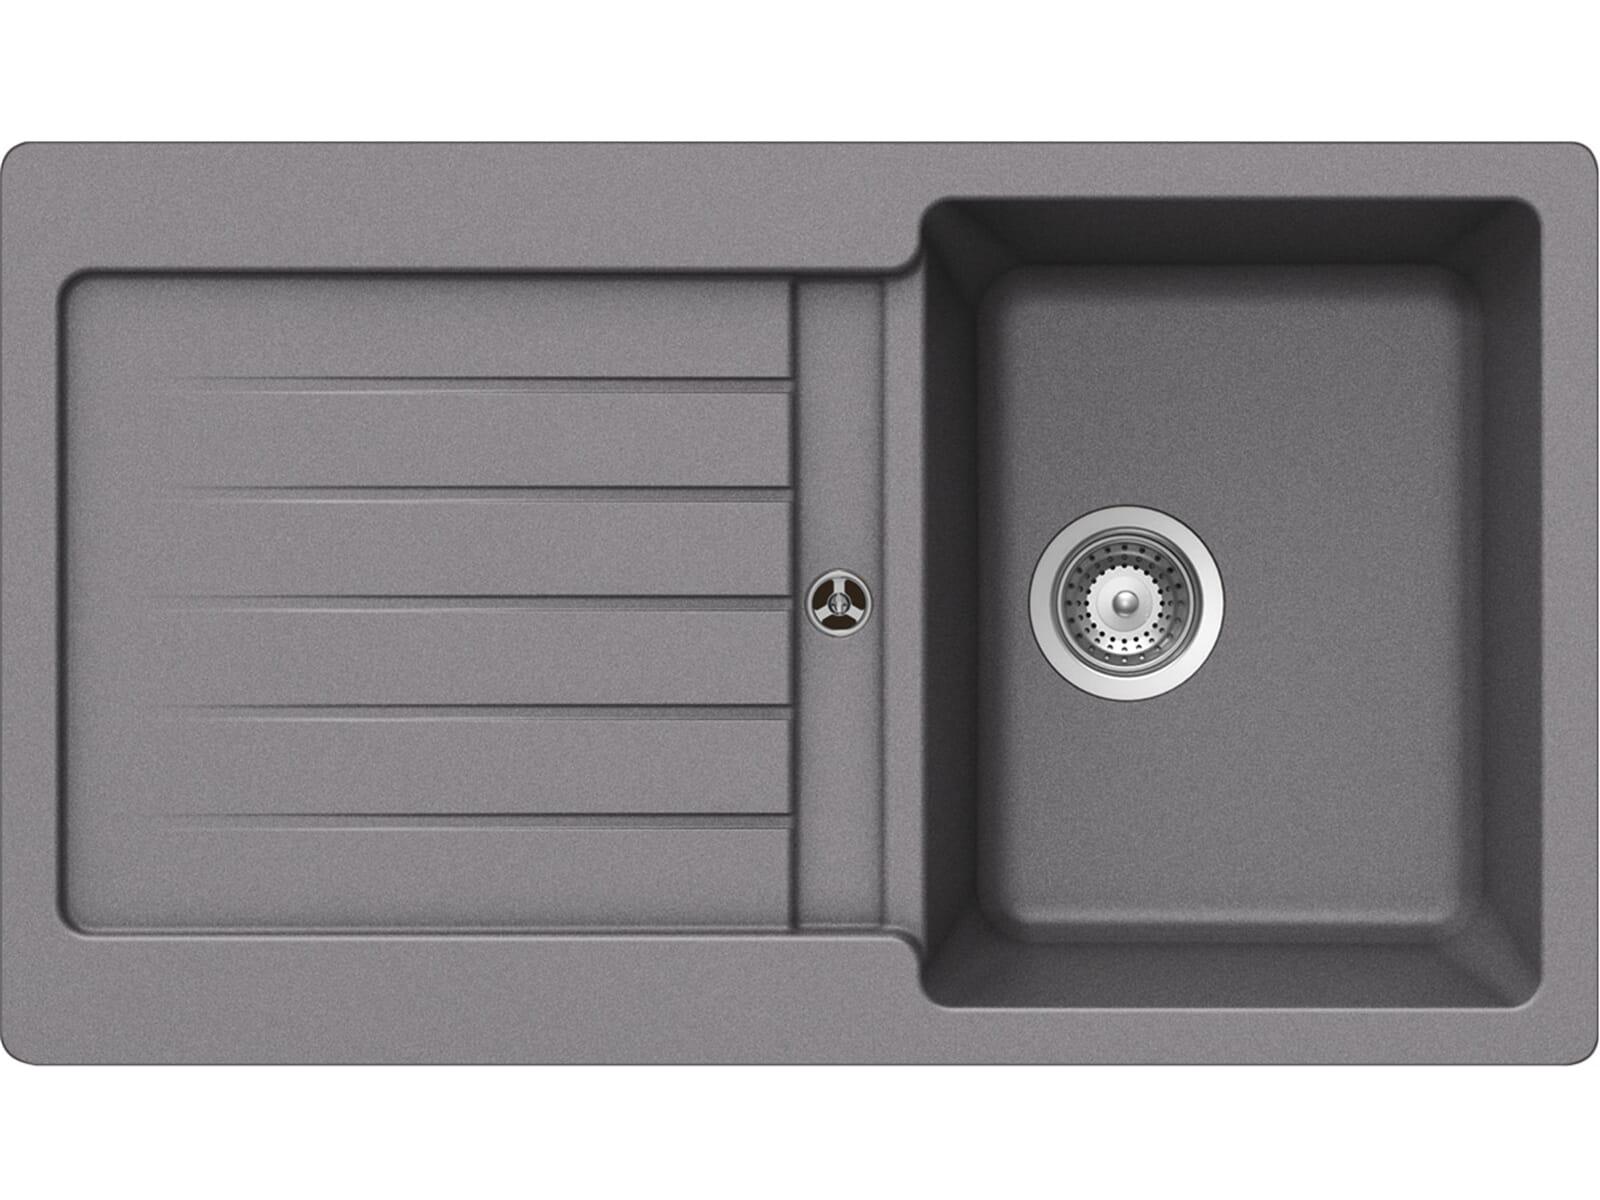 schock typos d 100 a croma granit sp le. Black Bedroom Furniture Sets. Home Design Ideas